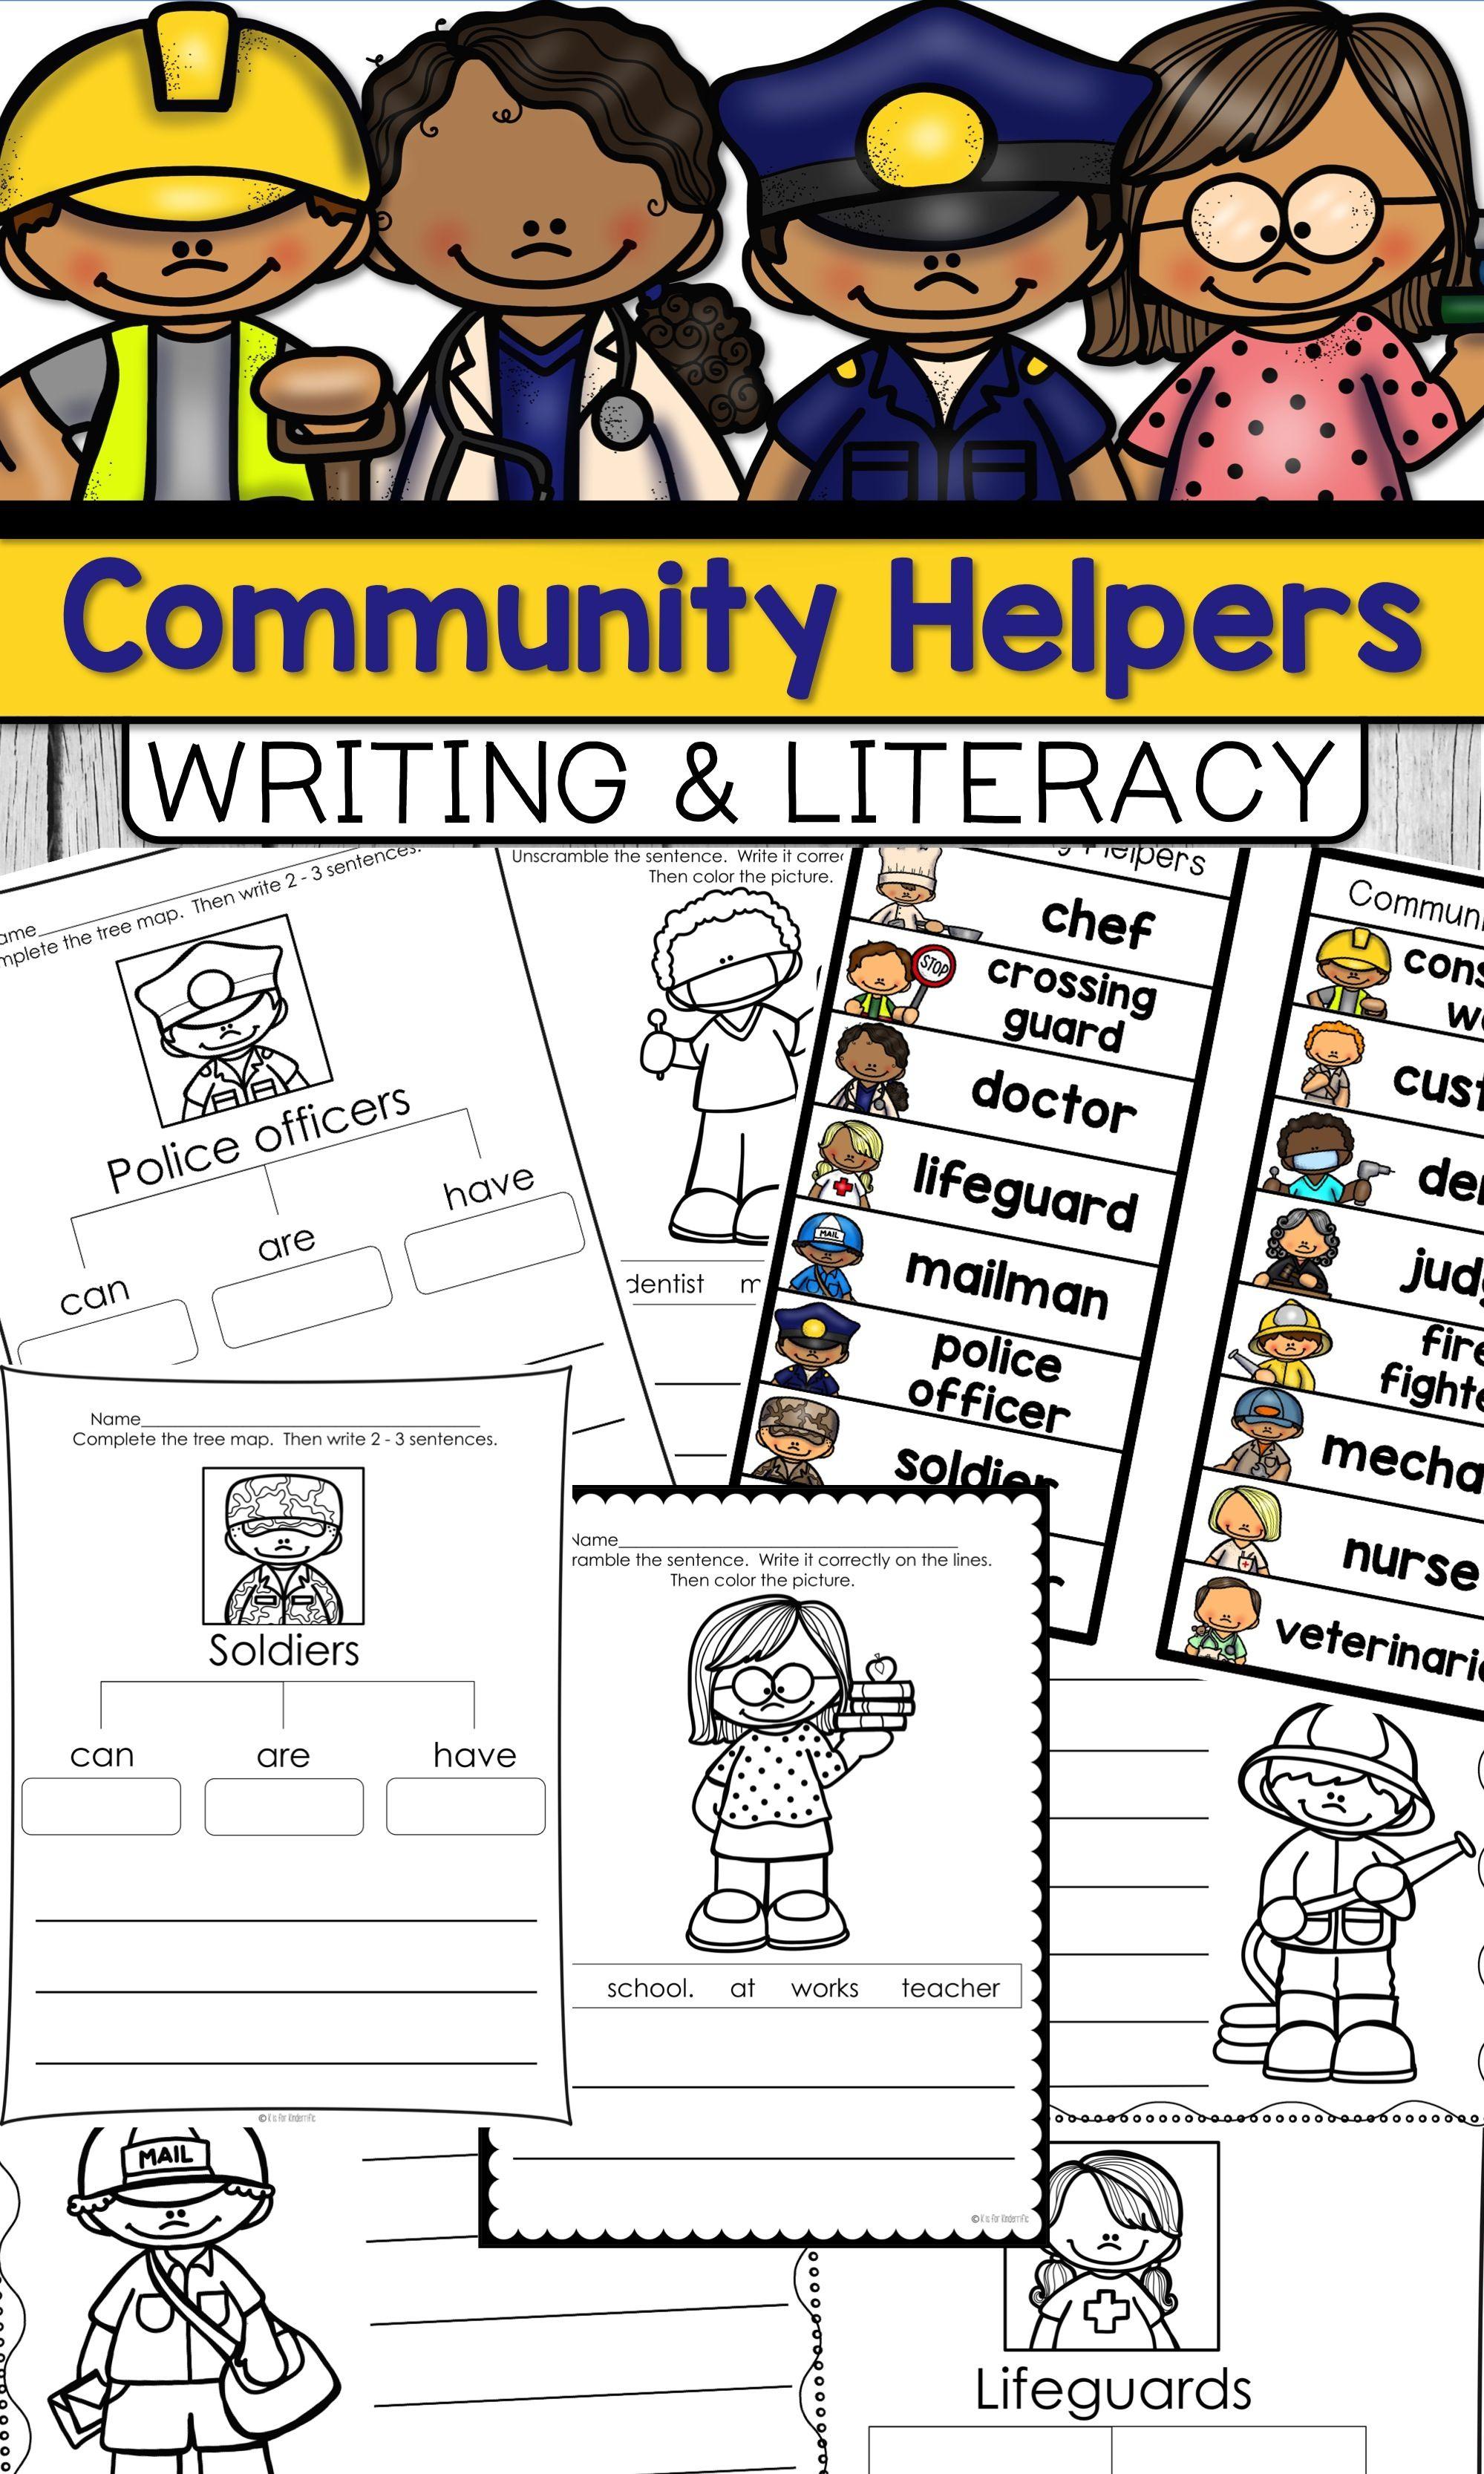 Community Helpers Writing